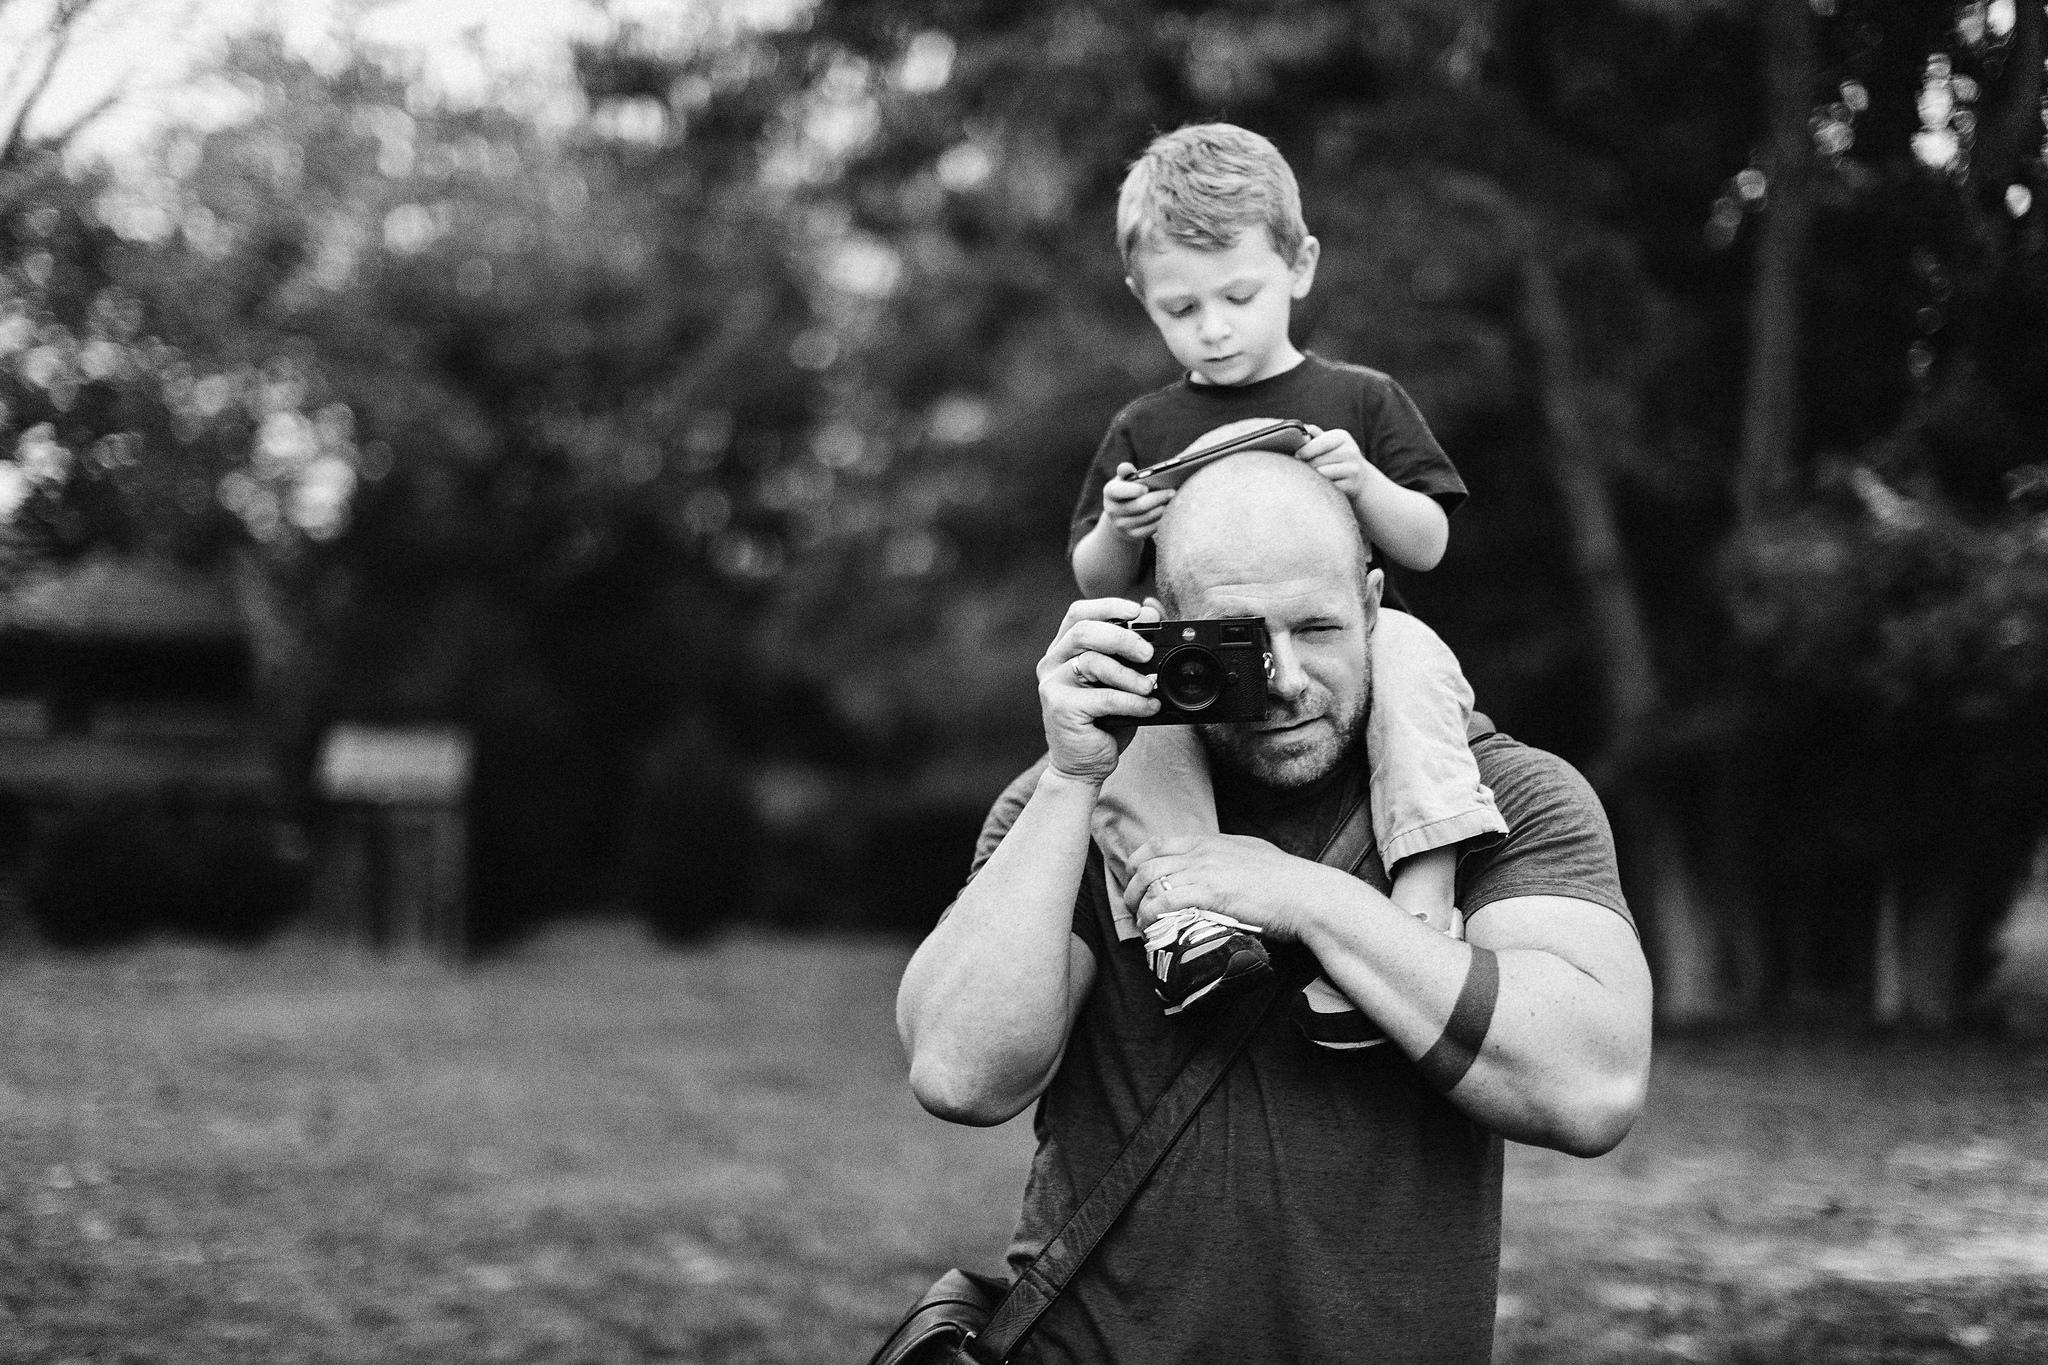 Jay+Cassario+Leica+Photographer.jpeg